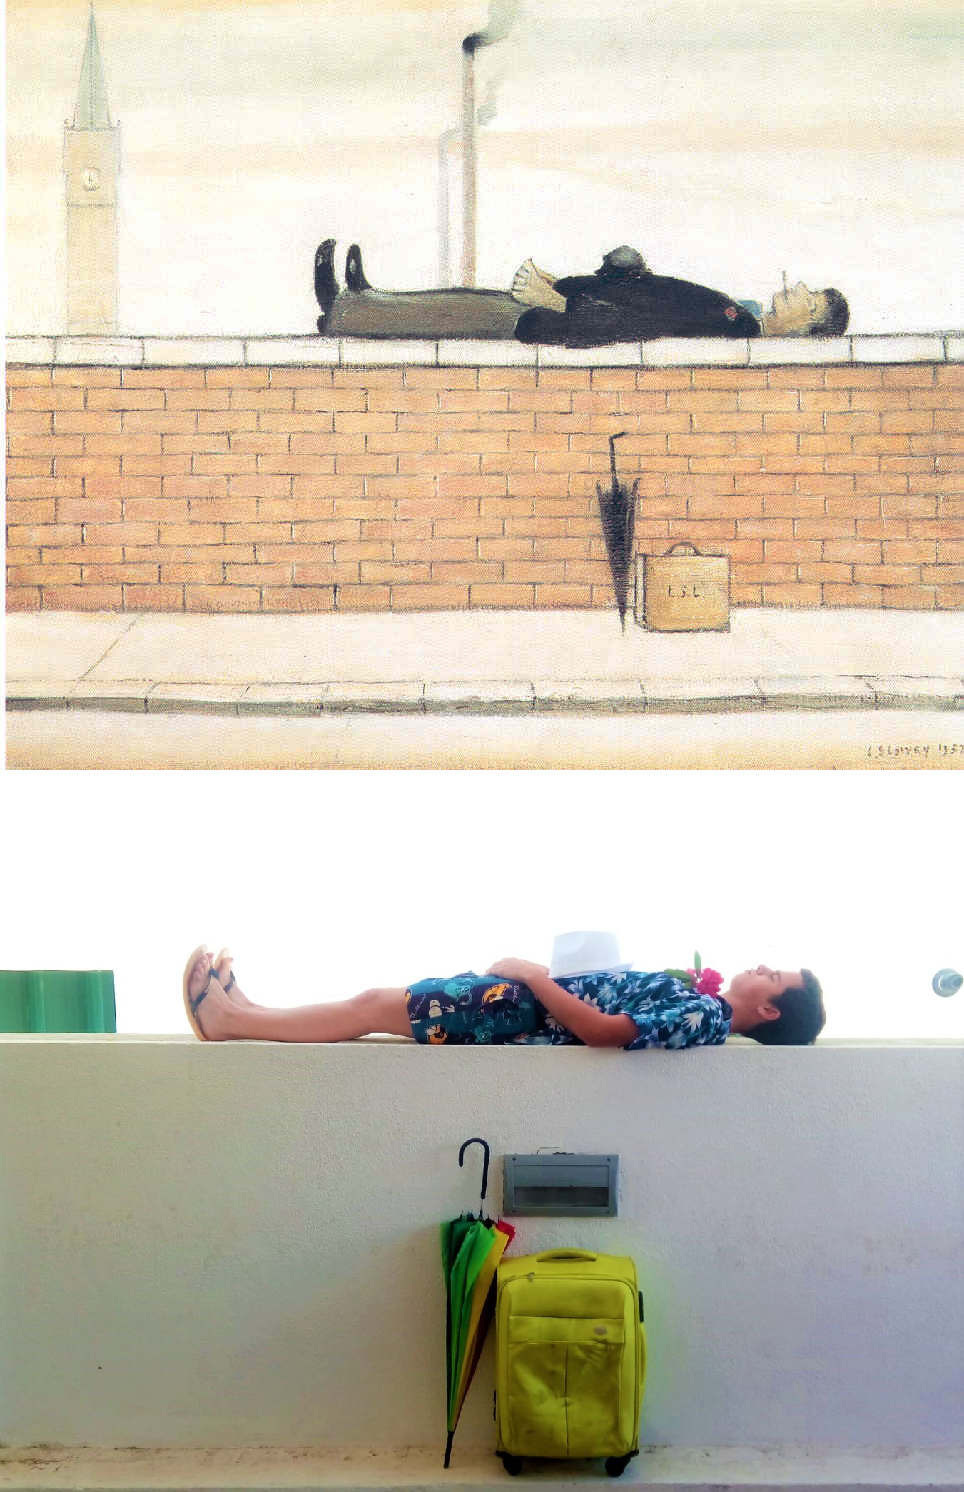 Animal Crossing Gay Porn Gif man lying on a wall, l s lowry (1887 – 1976) vango'dmaja